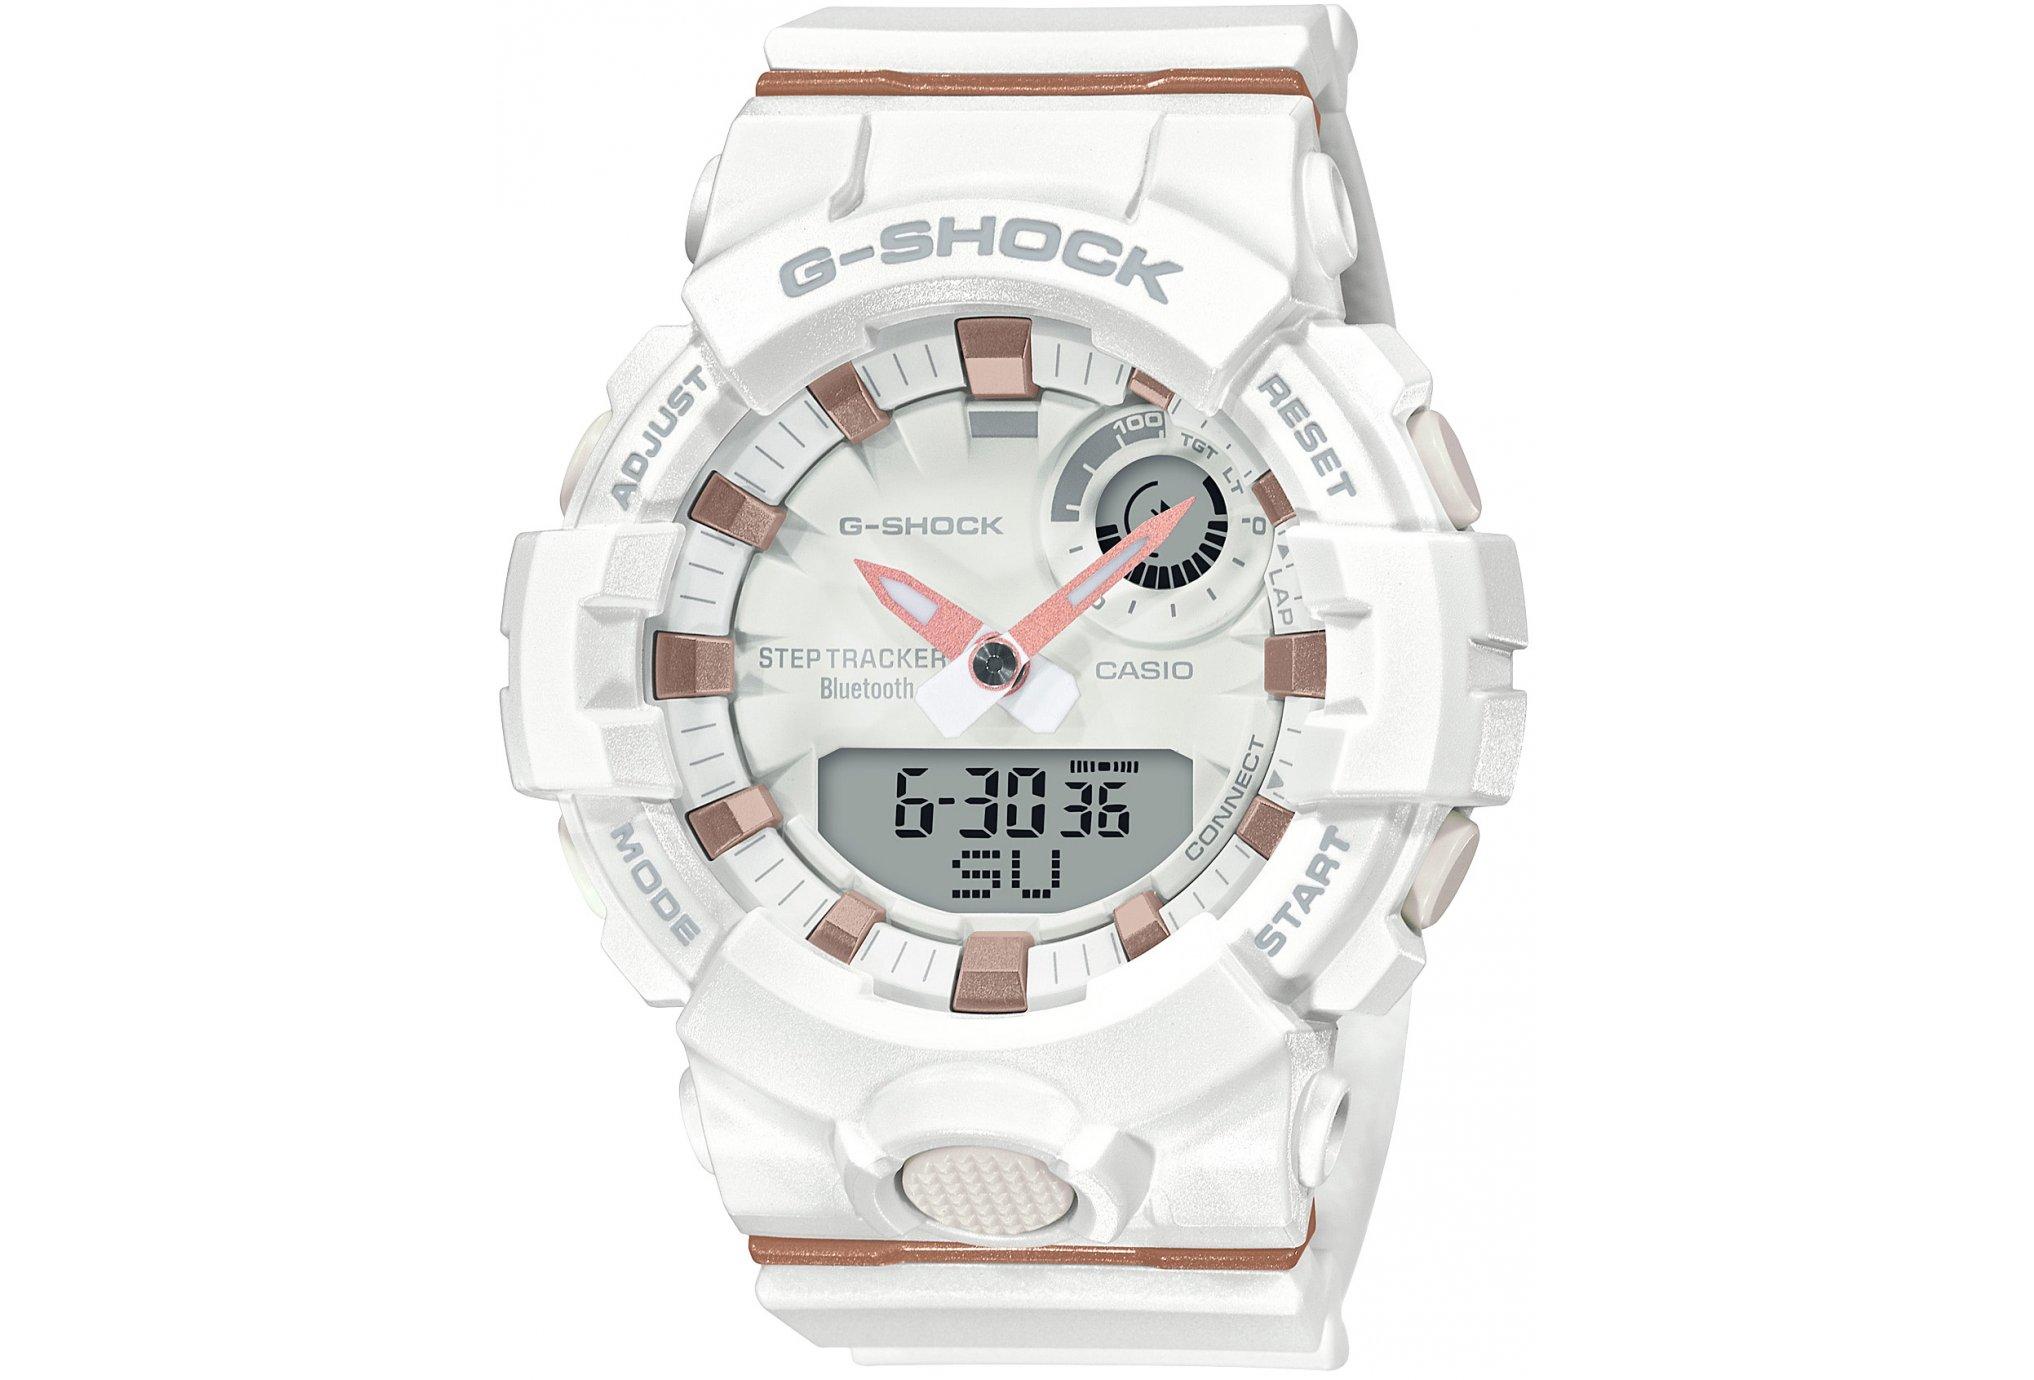 Casio G-SHOCK GMA-B800-7AER Montres de sport